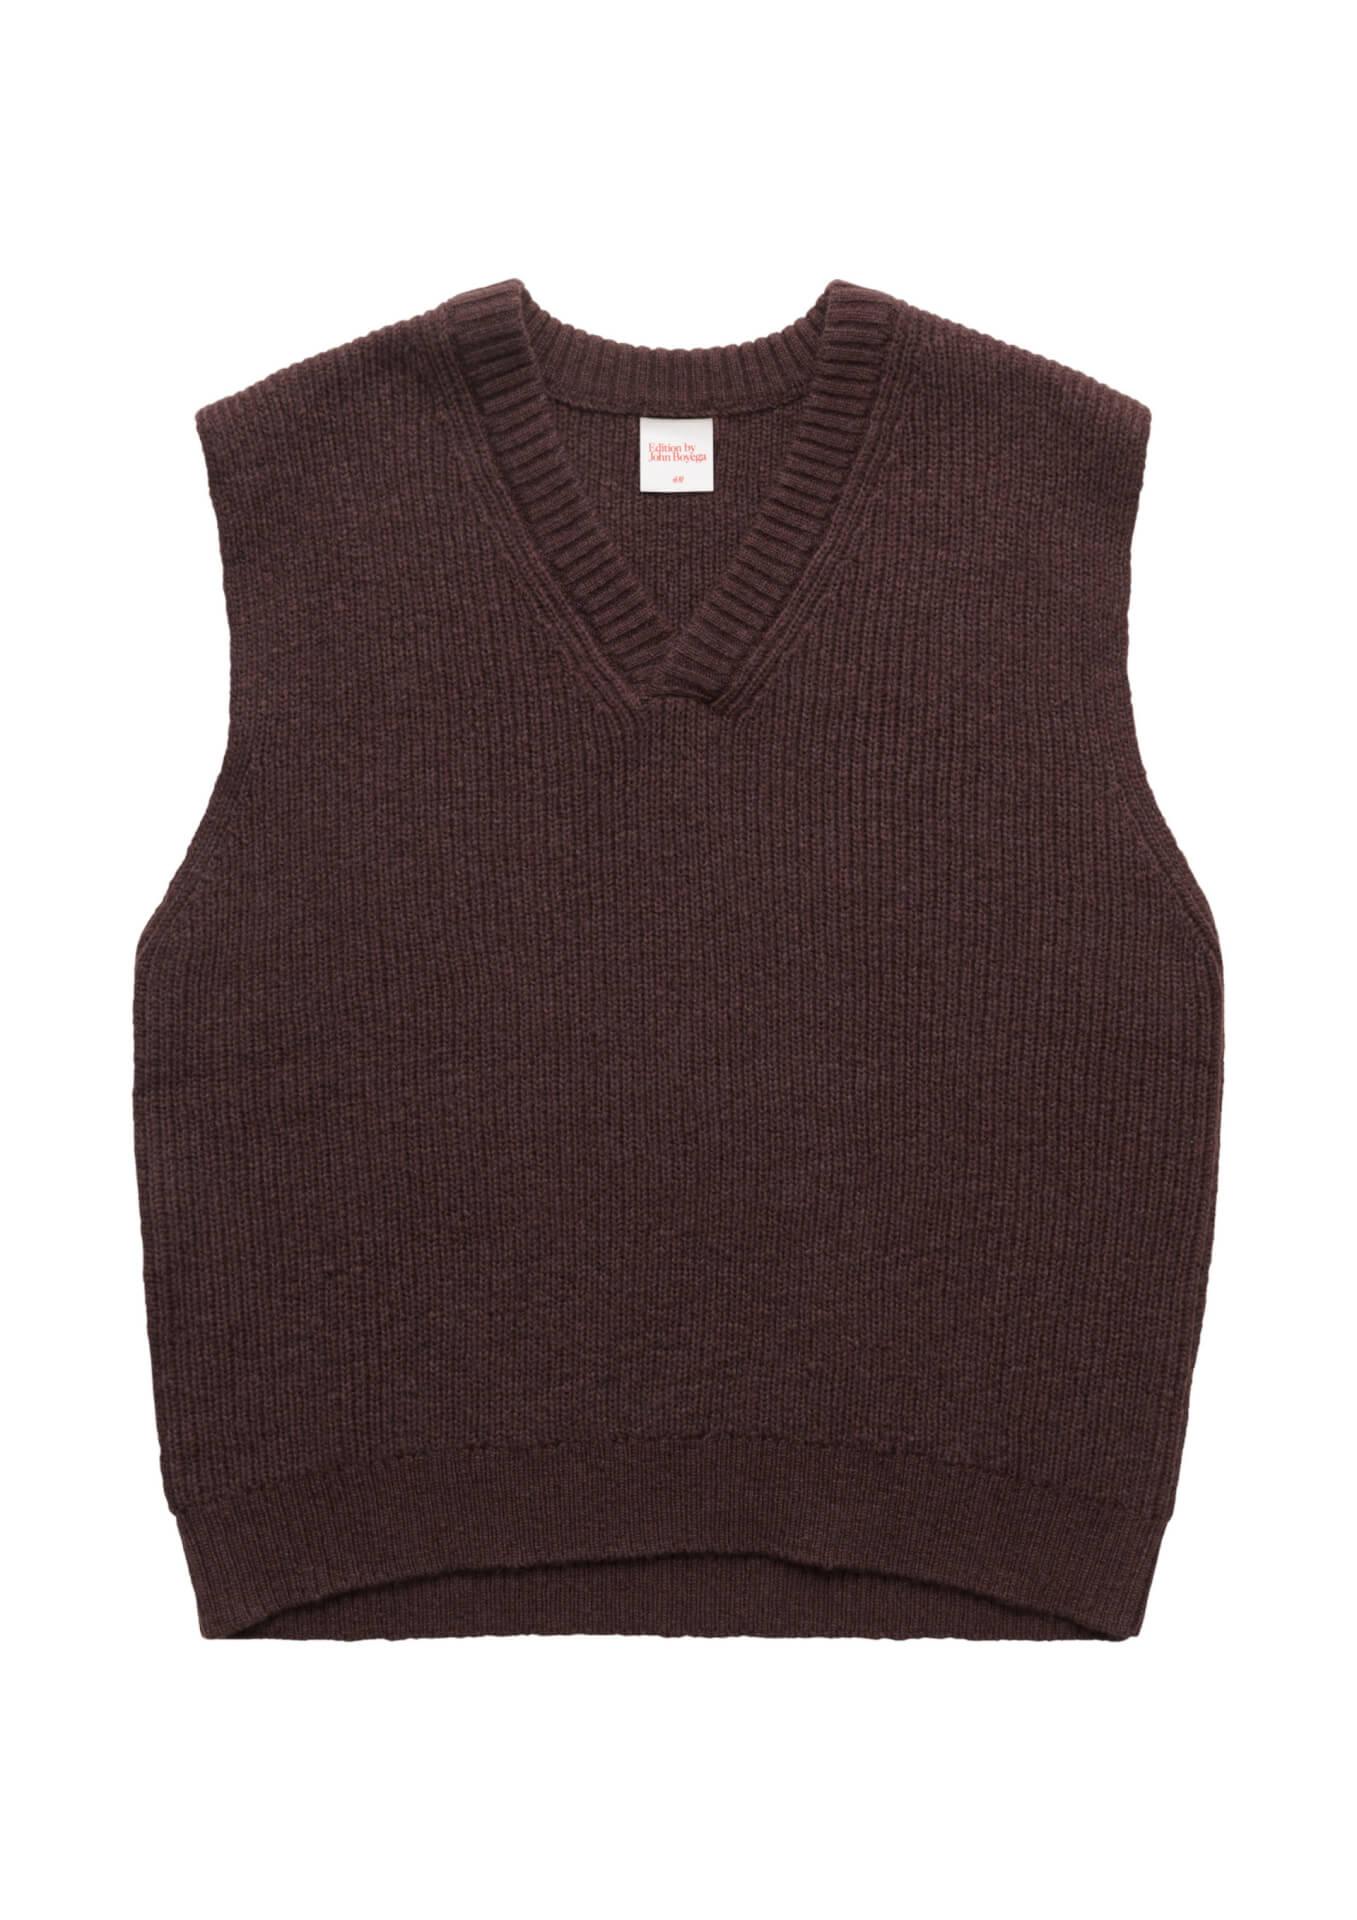 H&Mが俳優のジョン・ボイエガとタッグを組んだメンズウェアコレクションを発表!リサイクル素材、オーガニック素材を使用したアイテムが登場 life211006_handm_john_boyega_09